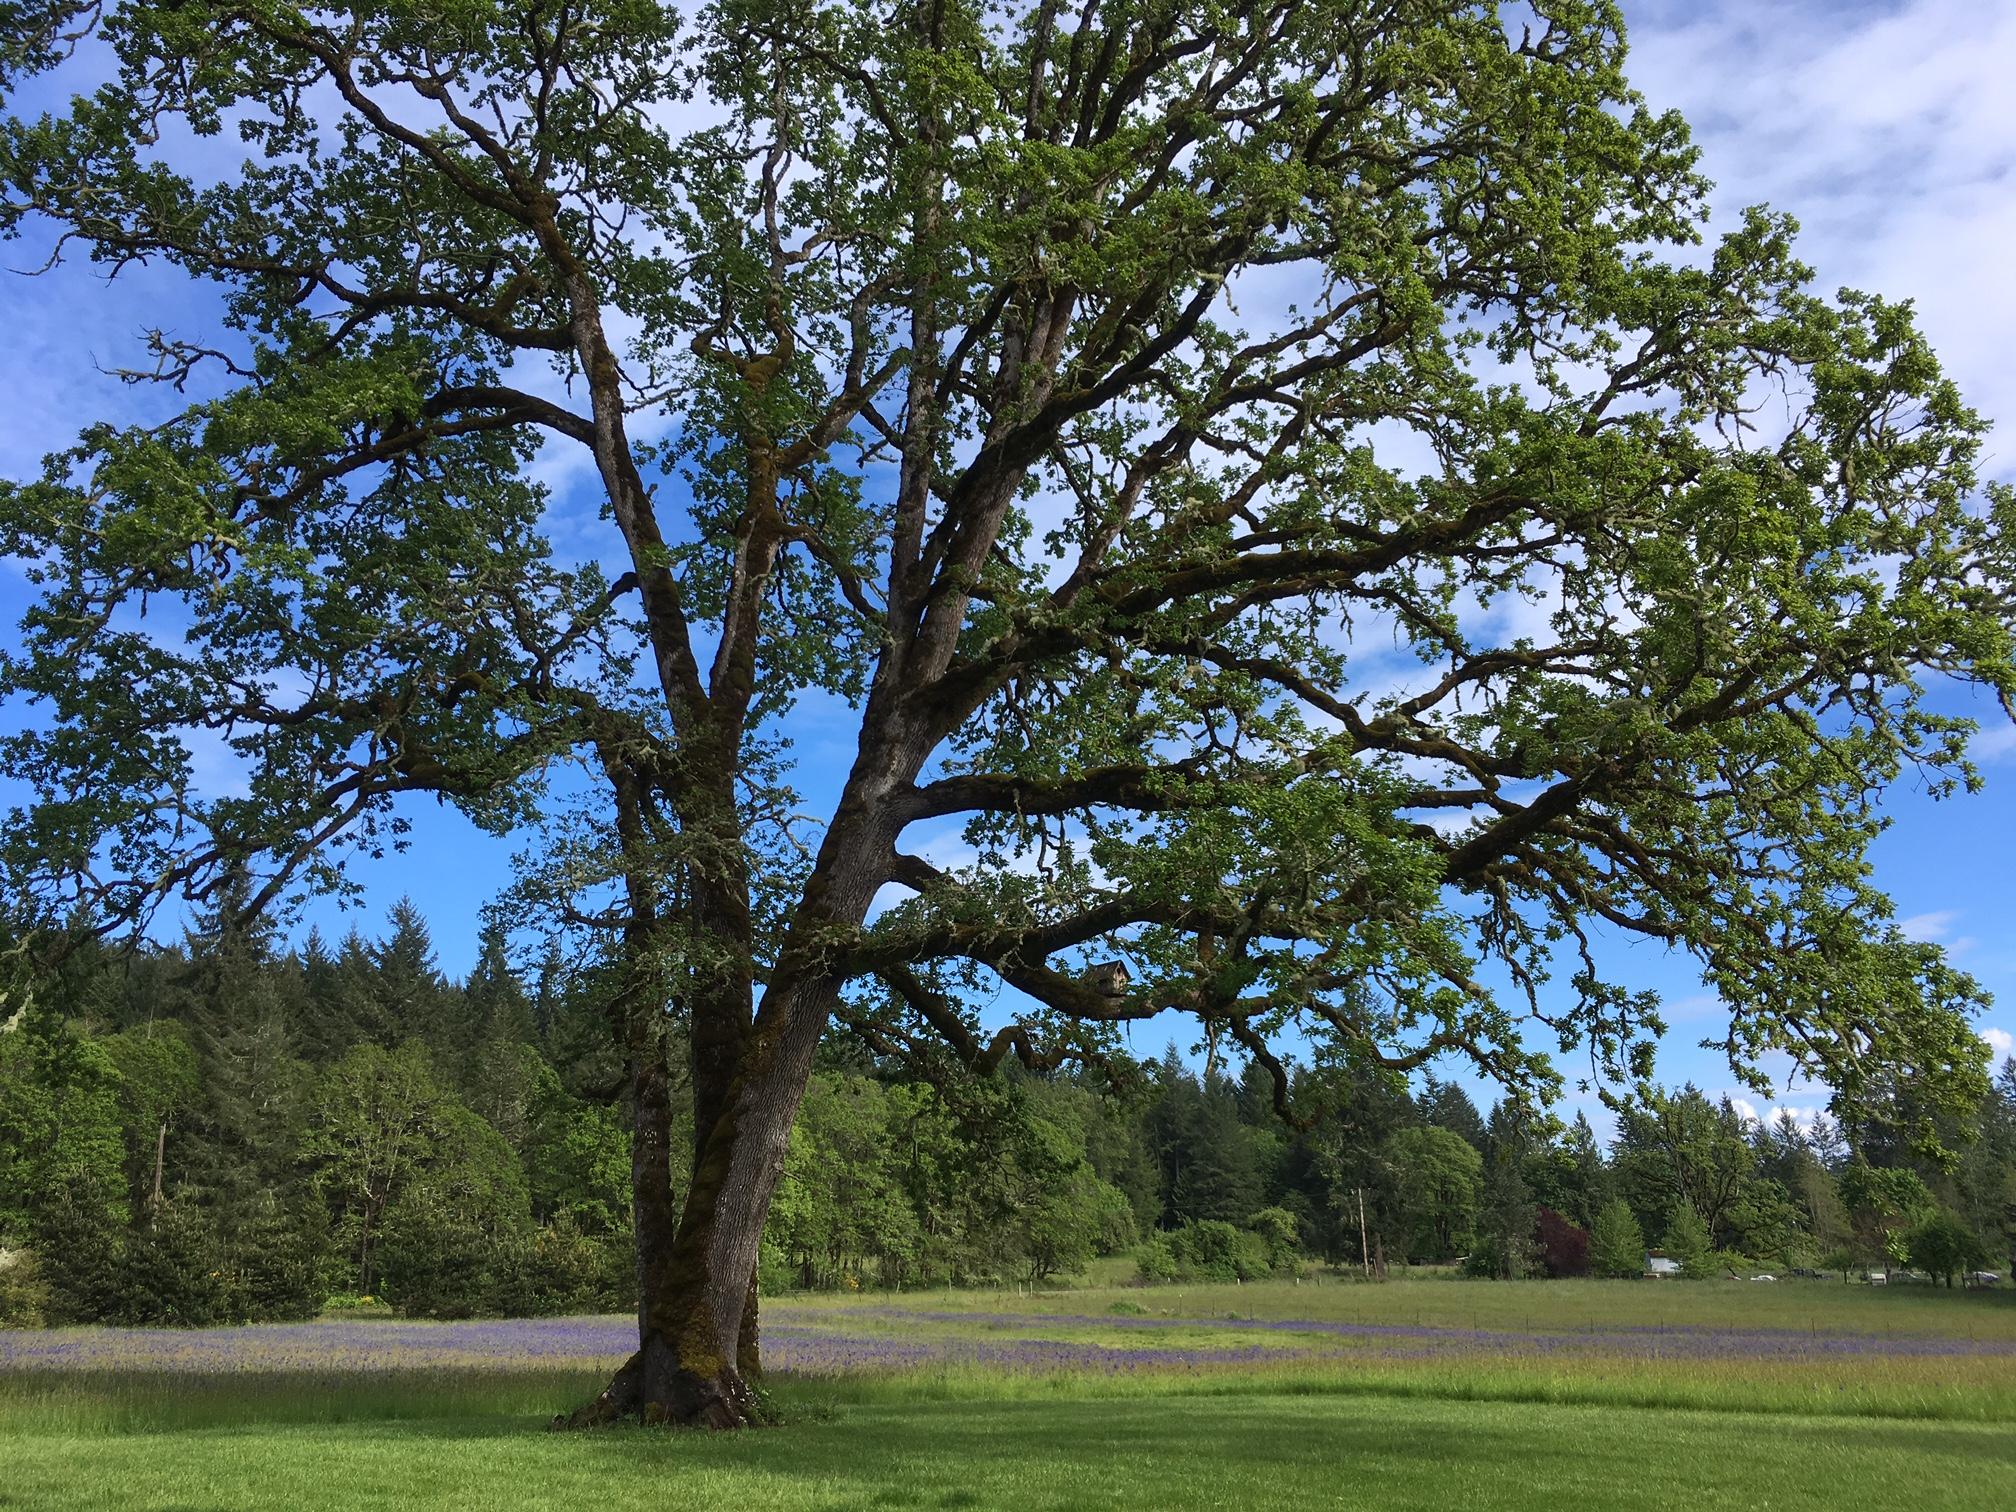 Oregon White Oak Trees